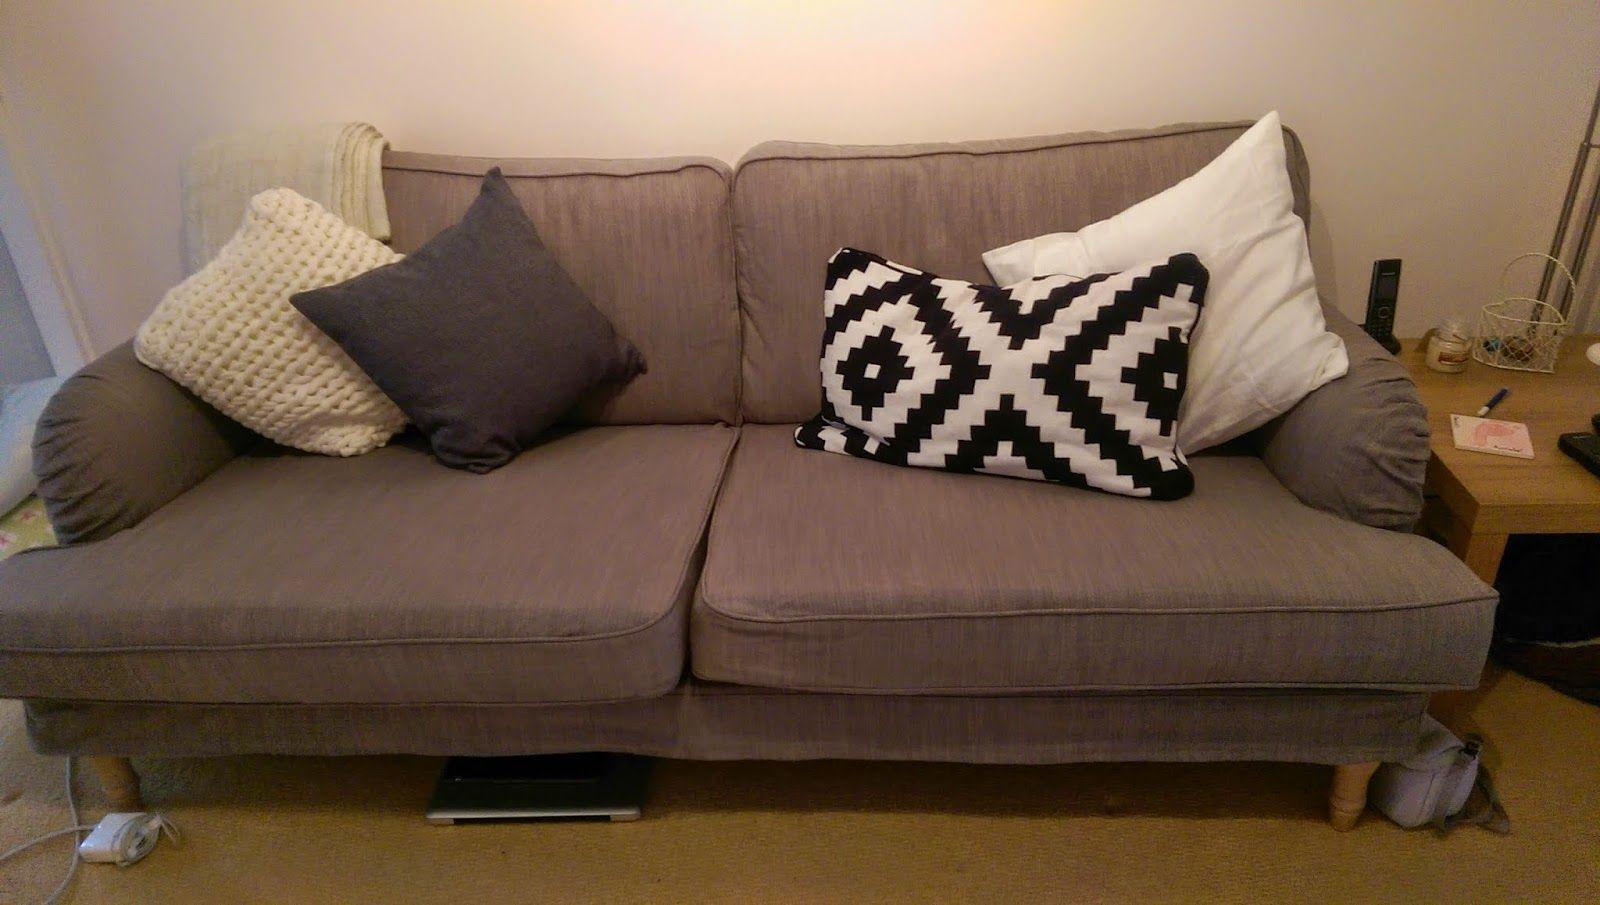 Ikea stocksund sofa ikea couchesliving pinterest living ikea stocksund sofa parisarafo Image collections